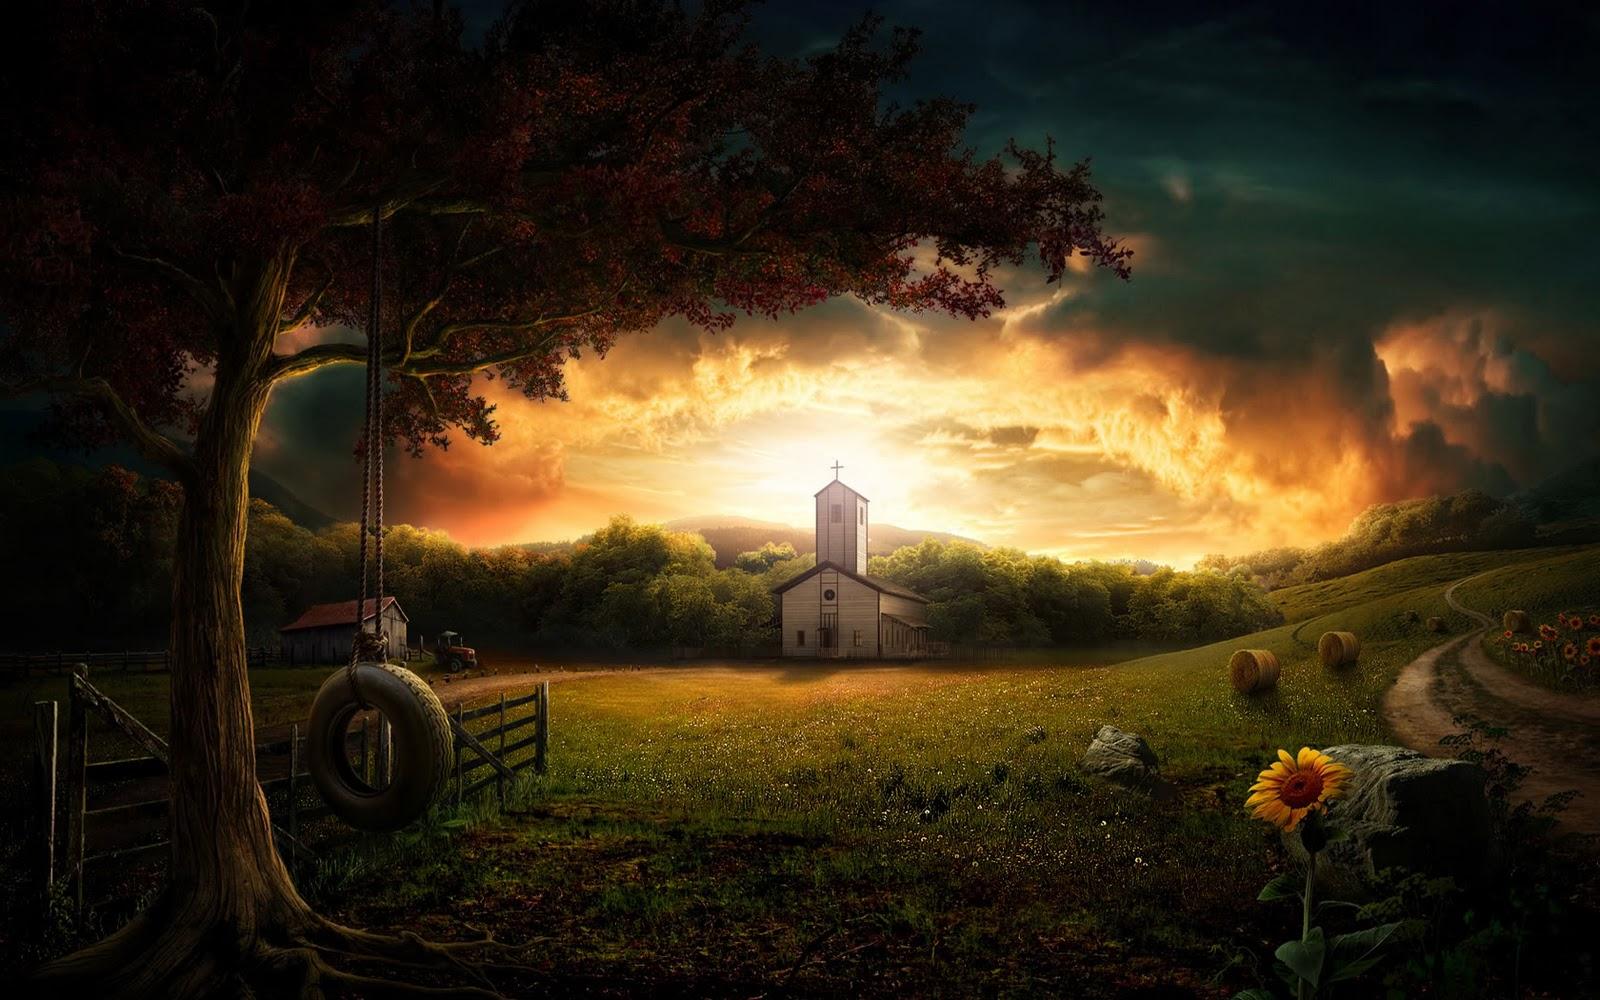 http://1.bp.blogspot.com/-FpRsd9Ul1uY/Txu0dPcXuOI/AAAAAAAANwM/7rbTMQNZ8Sk/s1600/1680x1050+HD+high+resolution+wallpapers.jpg